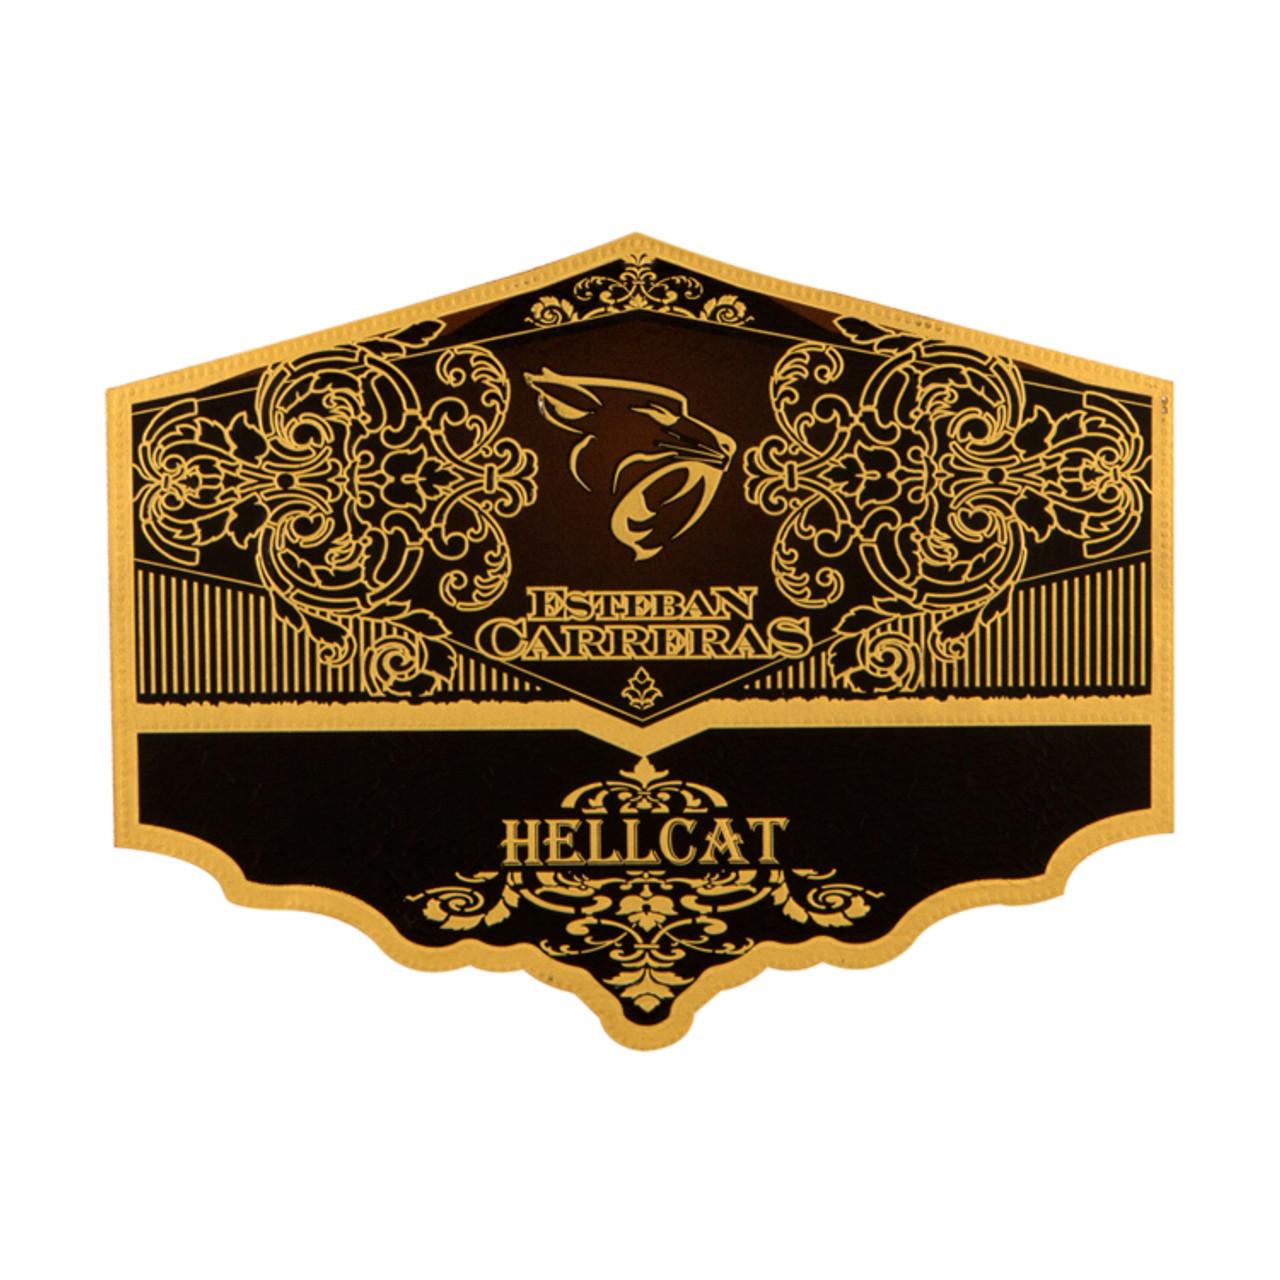 Esteban Carreras Chupacabra Hellcat Robusto Grande Cigars - 5.5 x 54 (Box of 20)